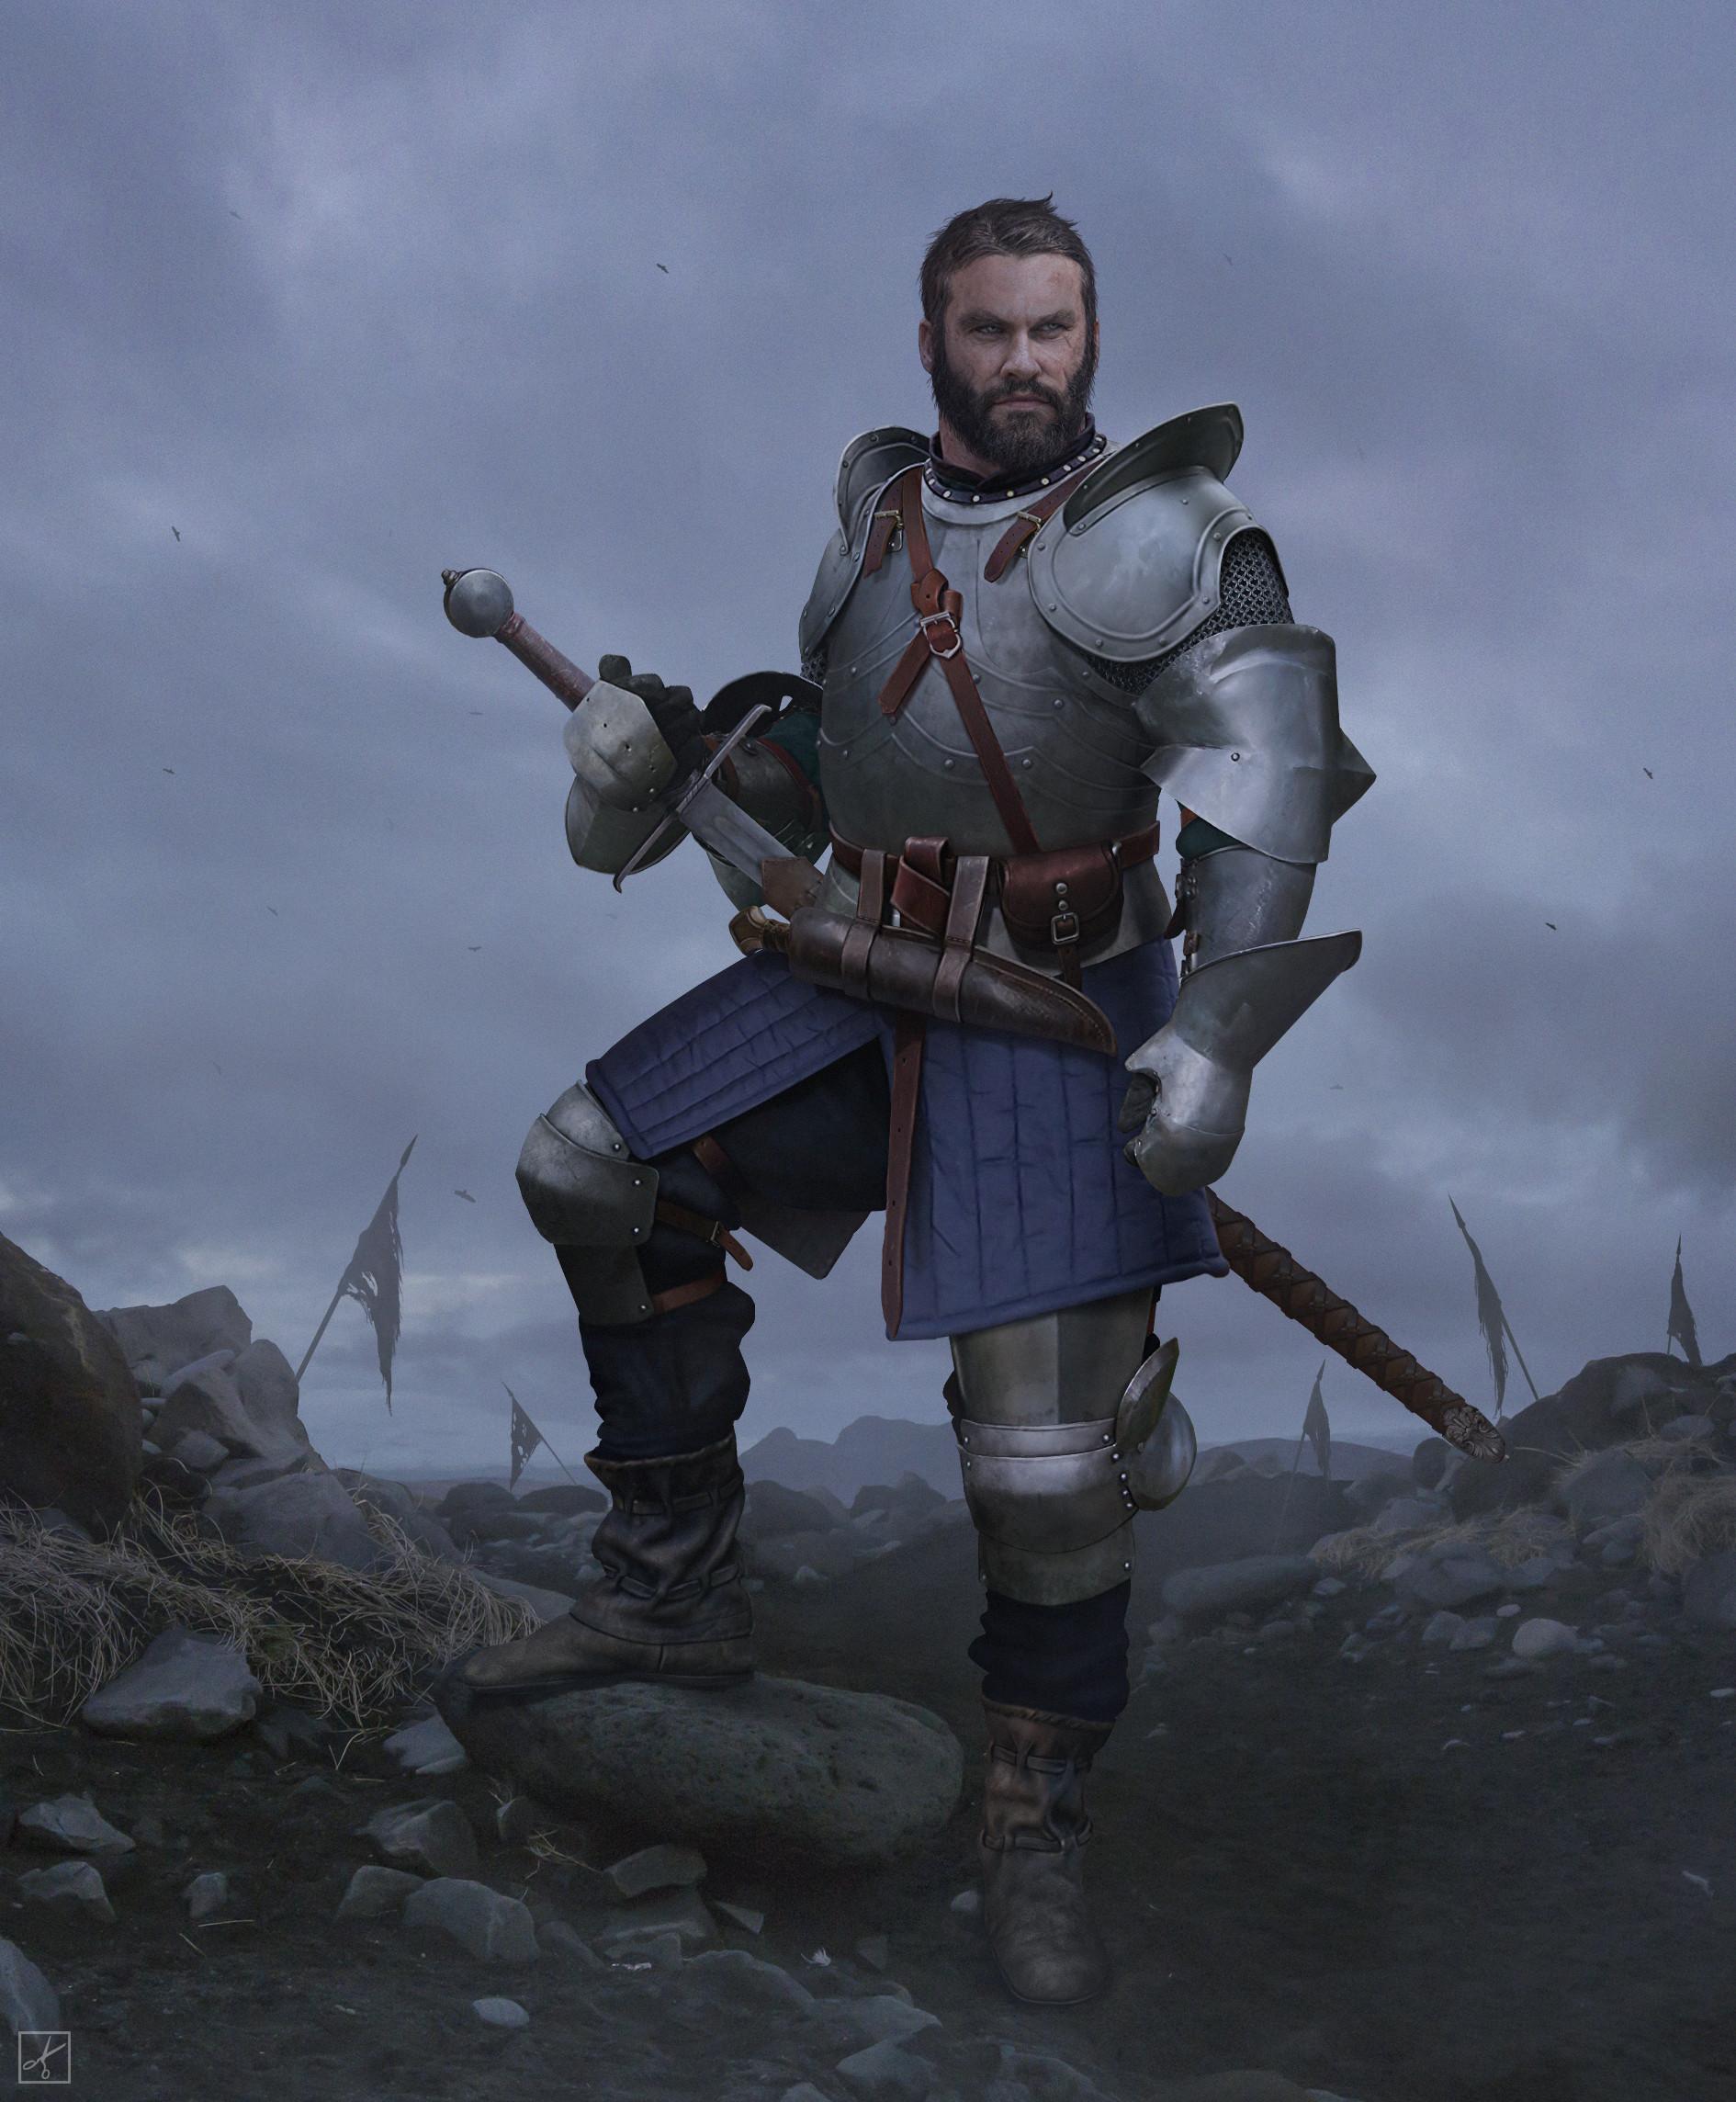 Pavel proskurin knight